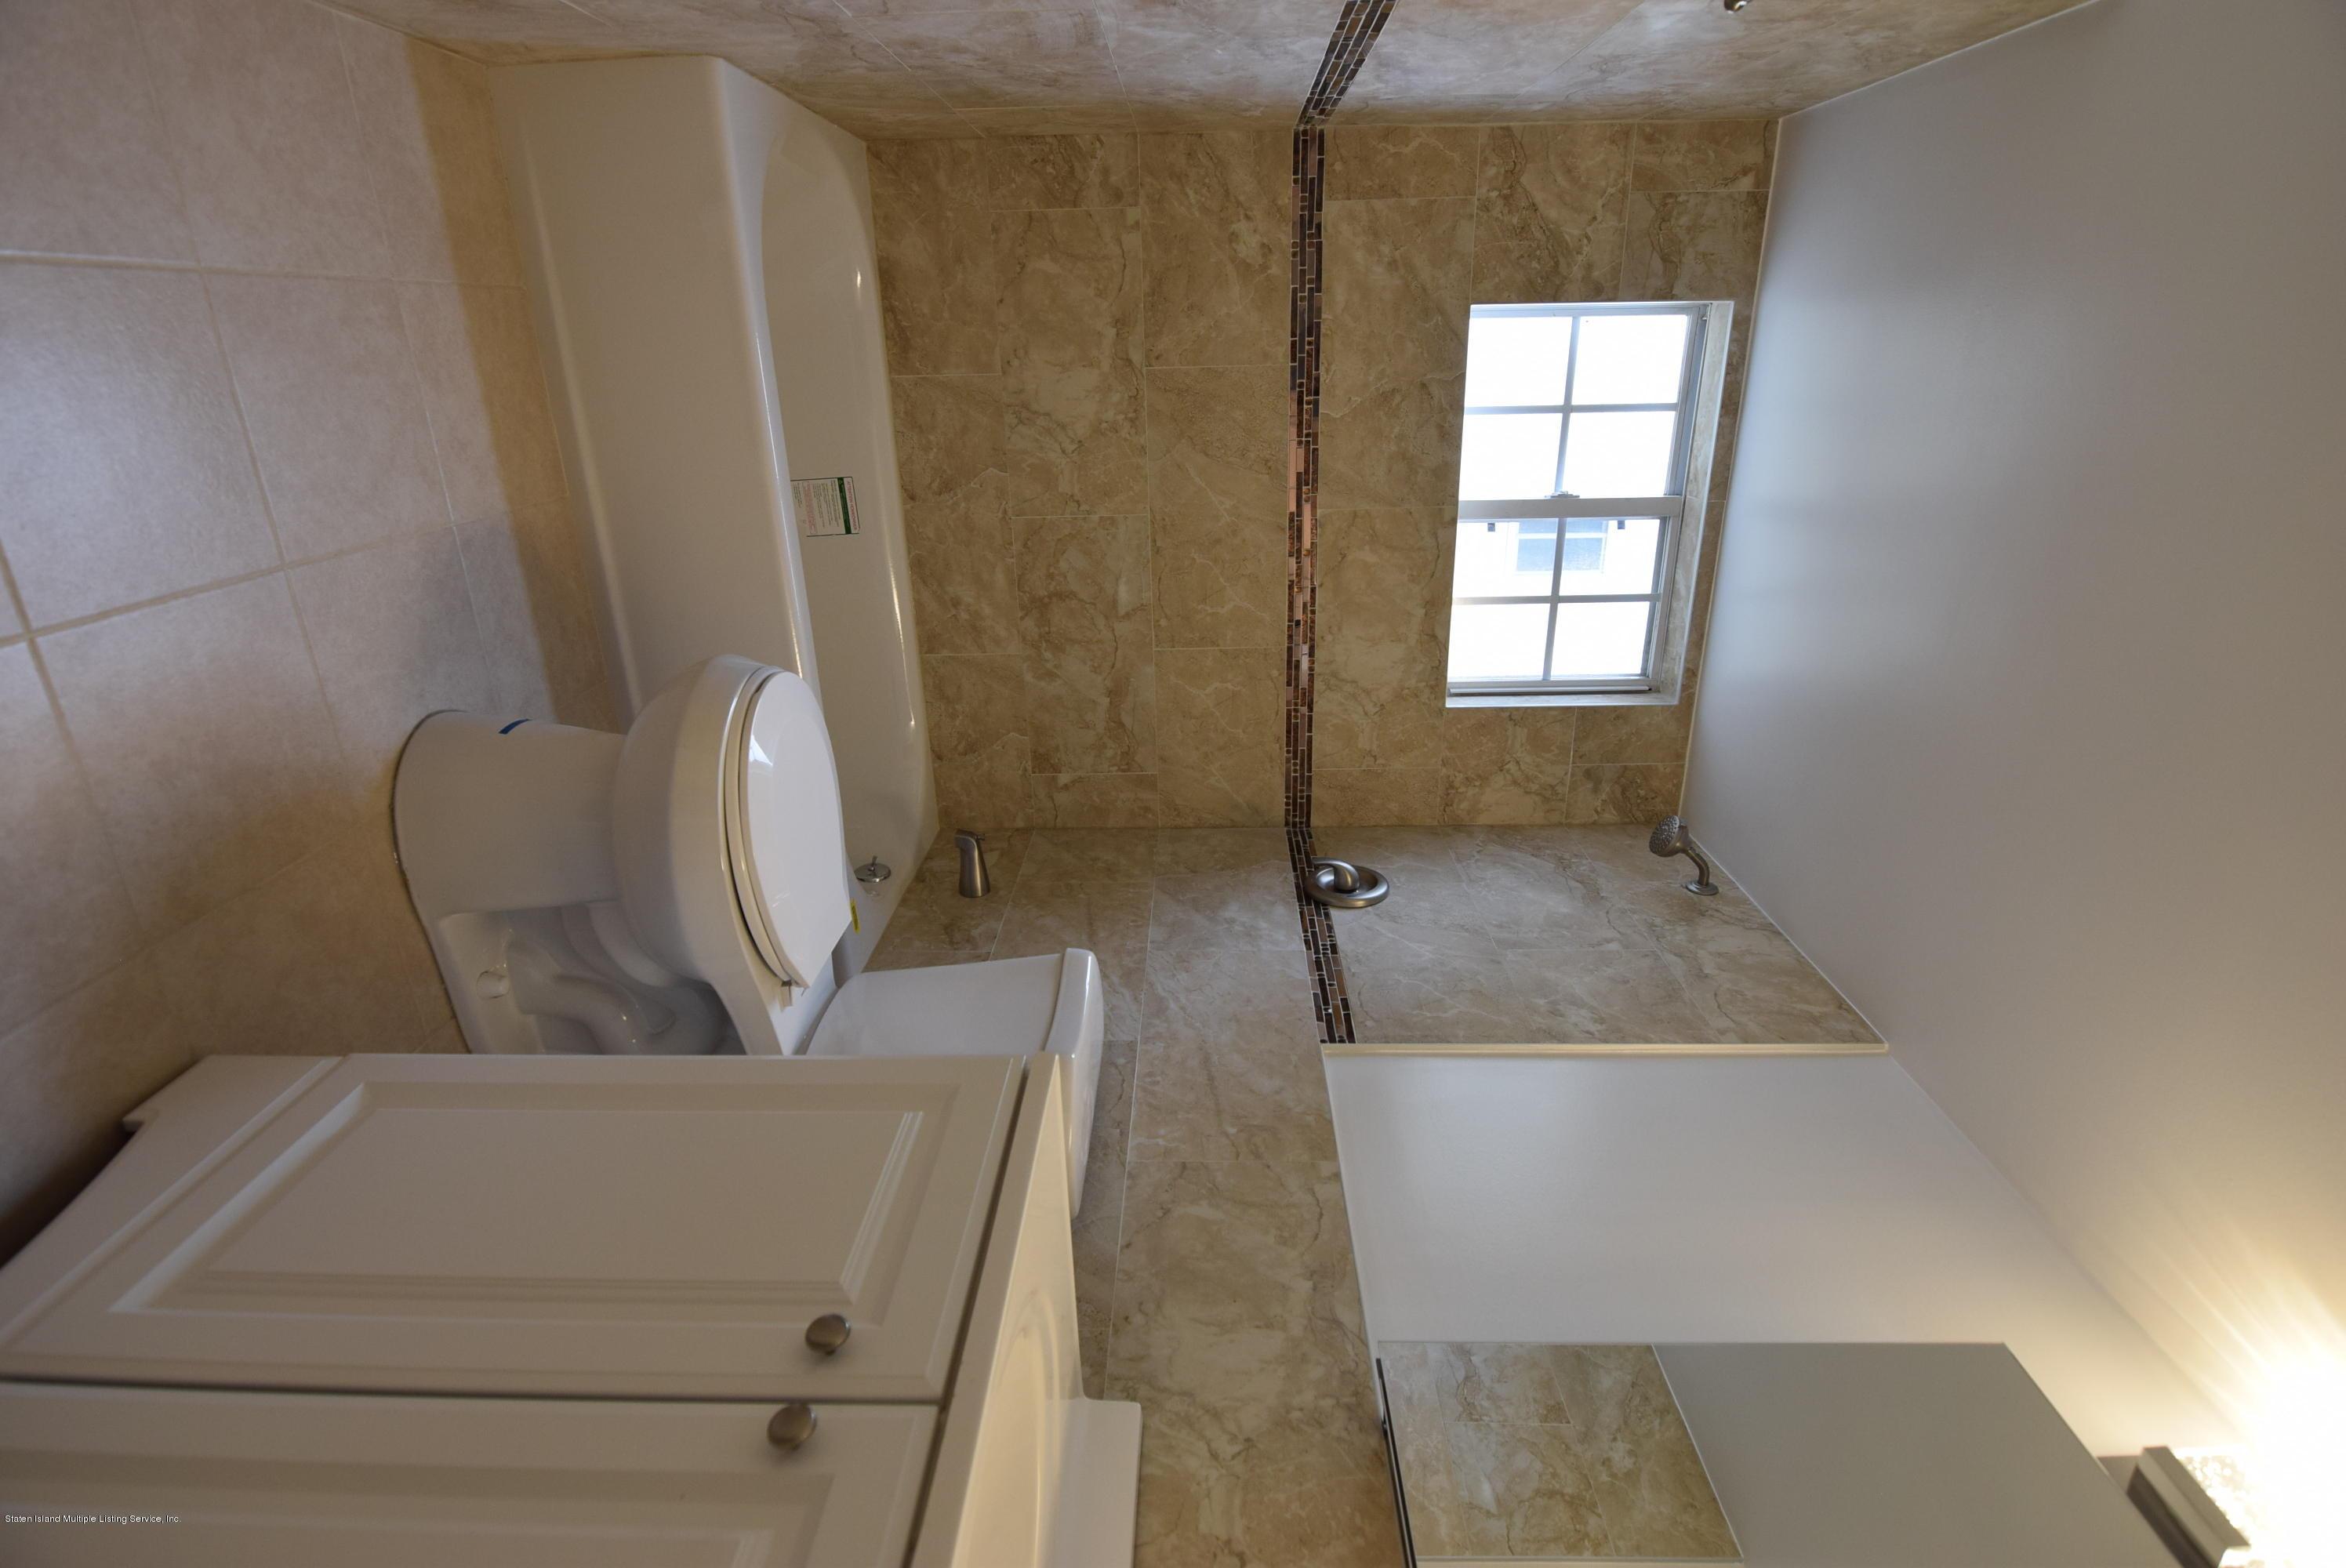 106 Pelican Circle,Staten Island,New York,10306,United States,2 Rooms Rooms,1 BathroomBathrooms,Res-Rental,Pelican,1135558